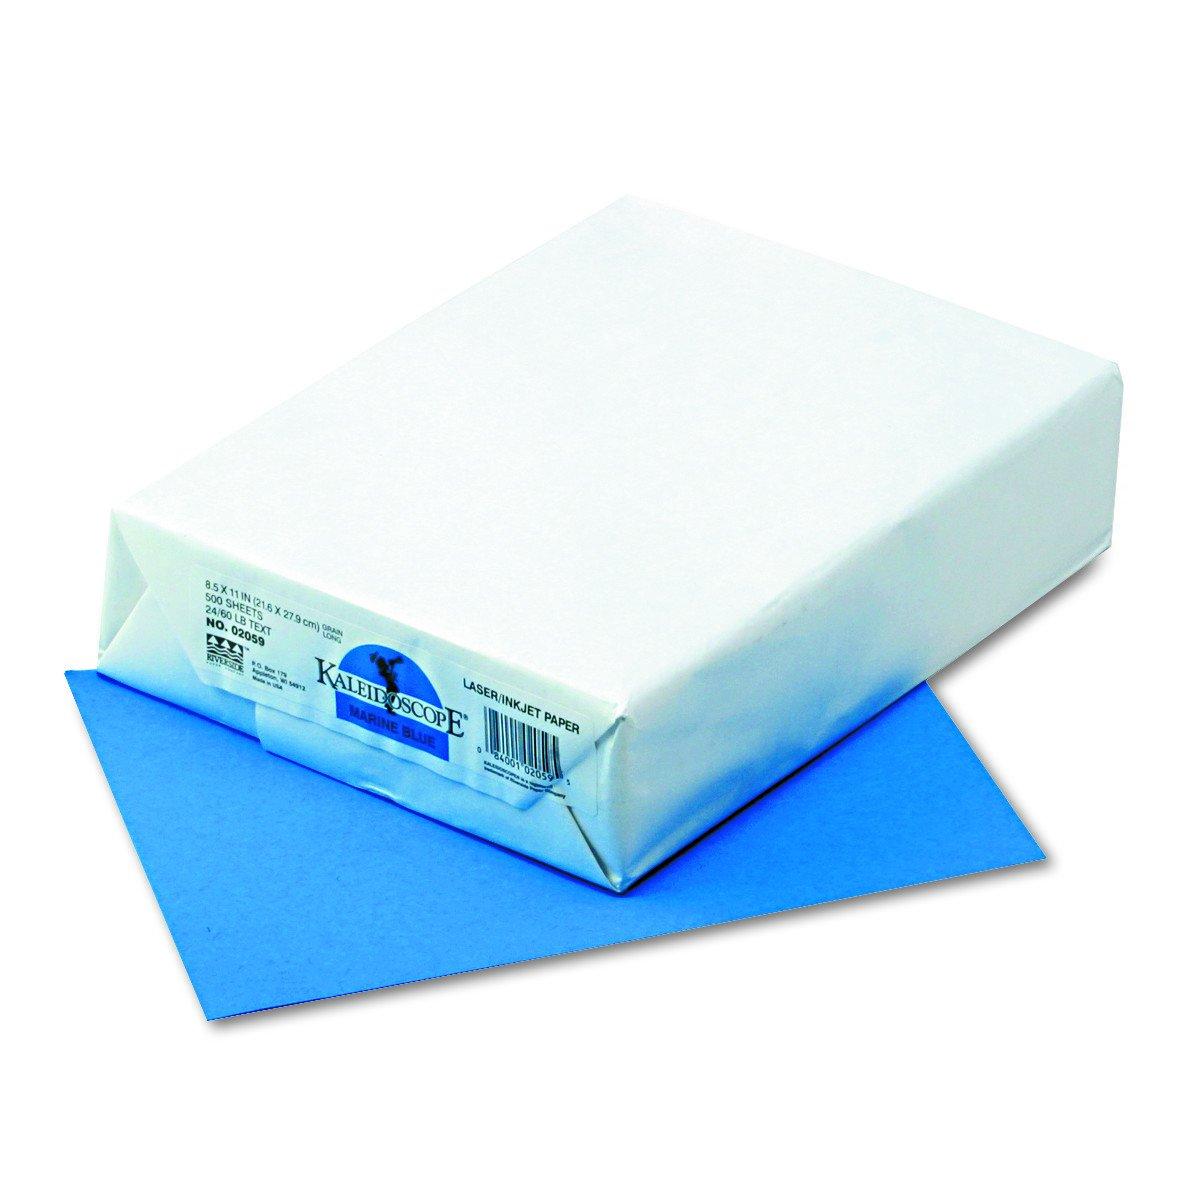 Kaleidoscope Multi-Purpose Paper, 8.5 x 11 Inches, Marine Blue, 500 Sheets (102059)